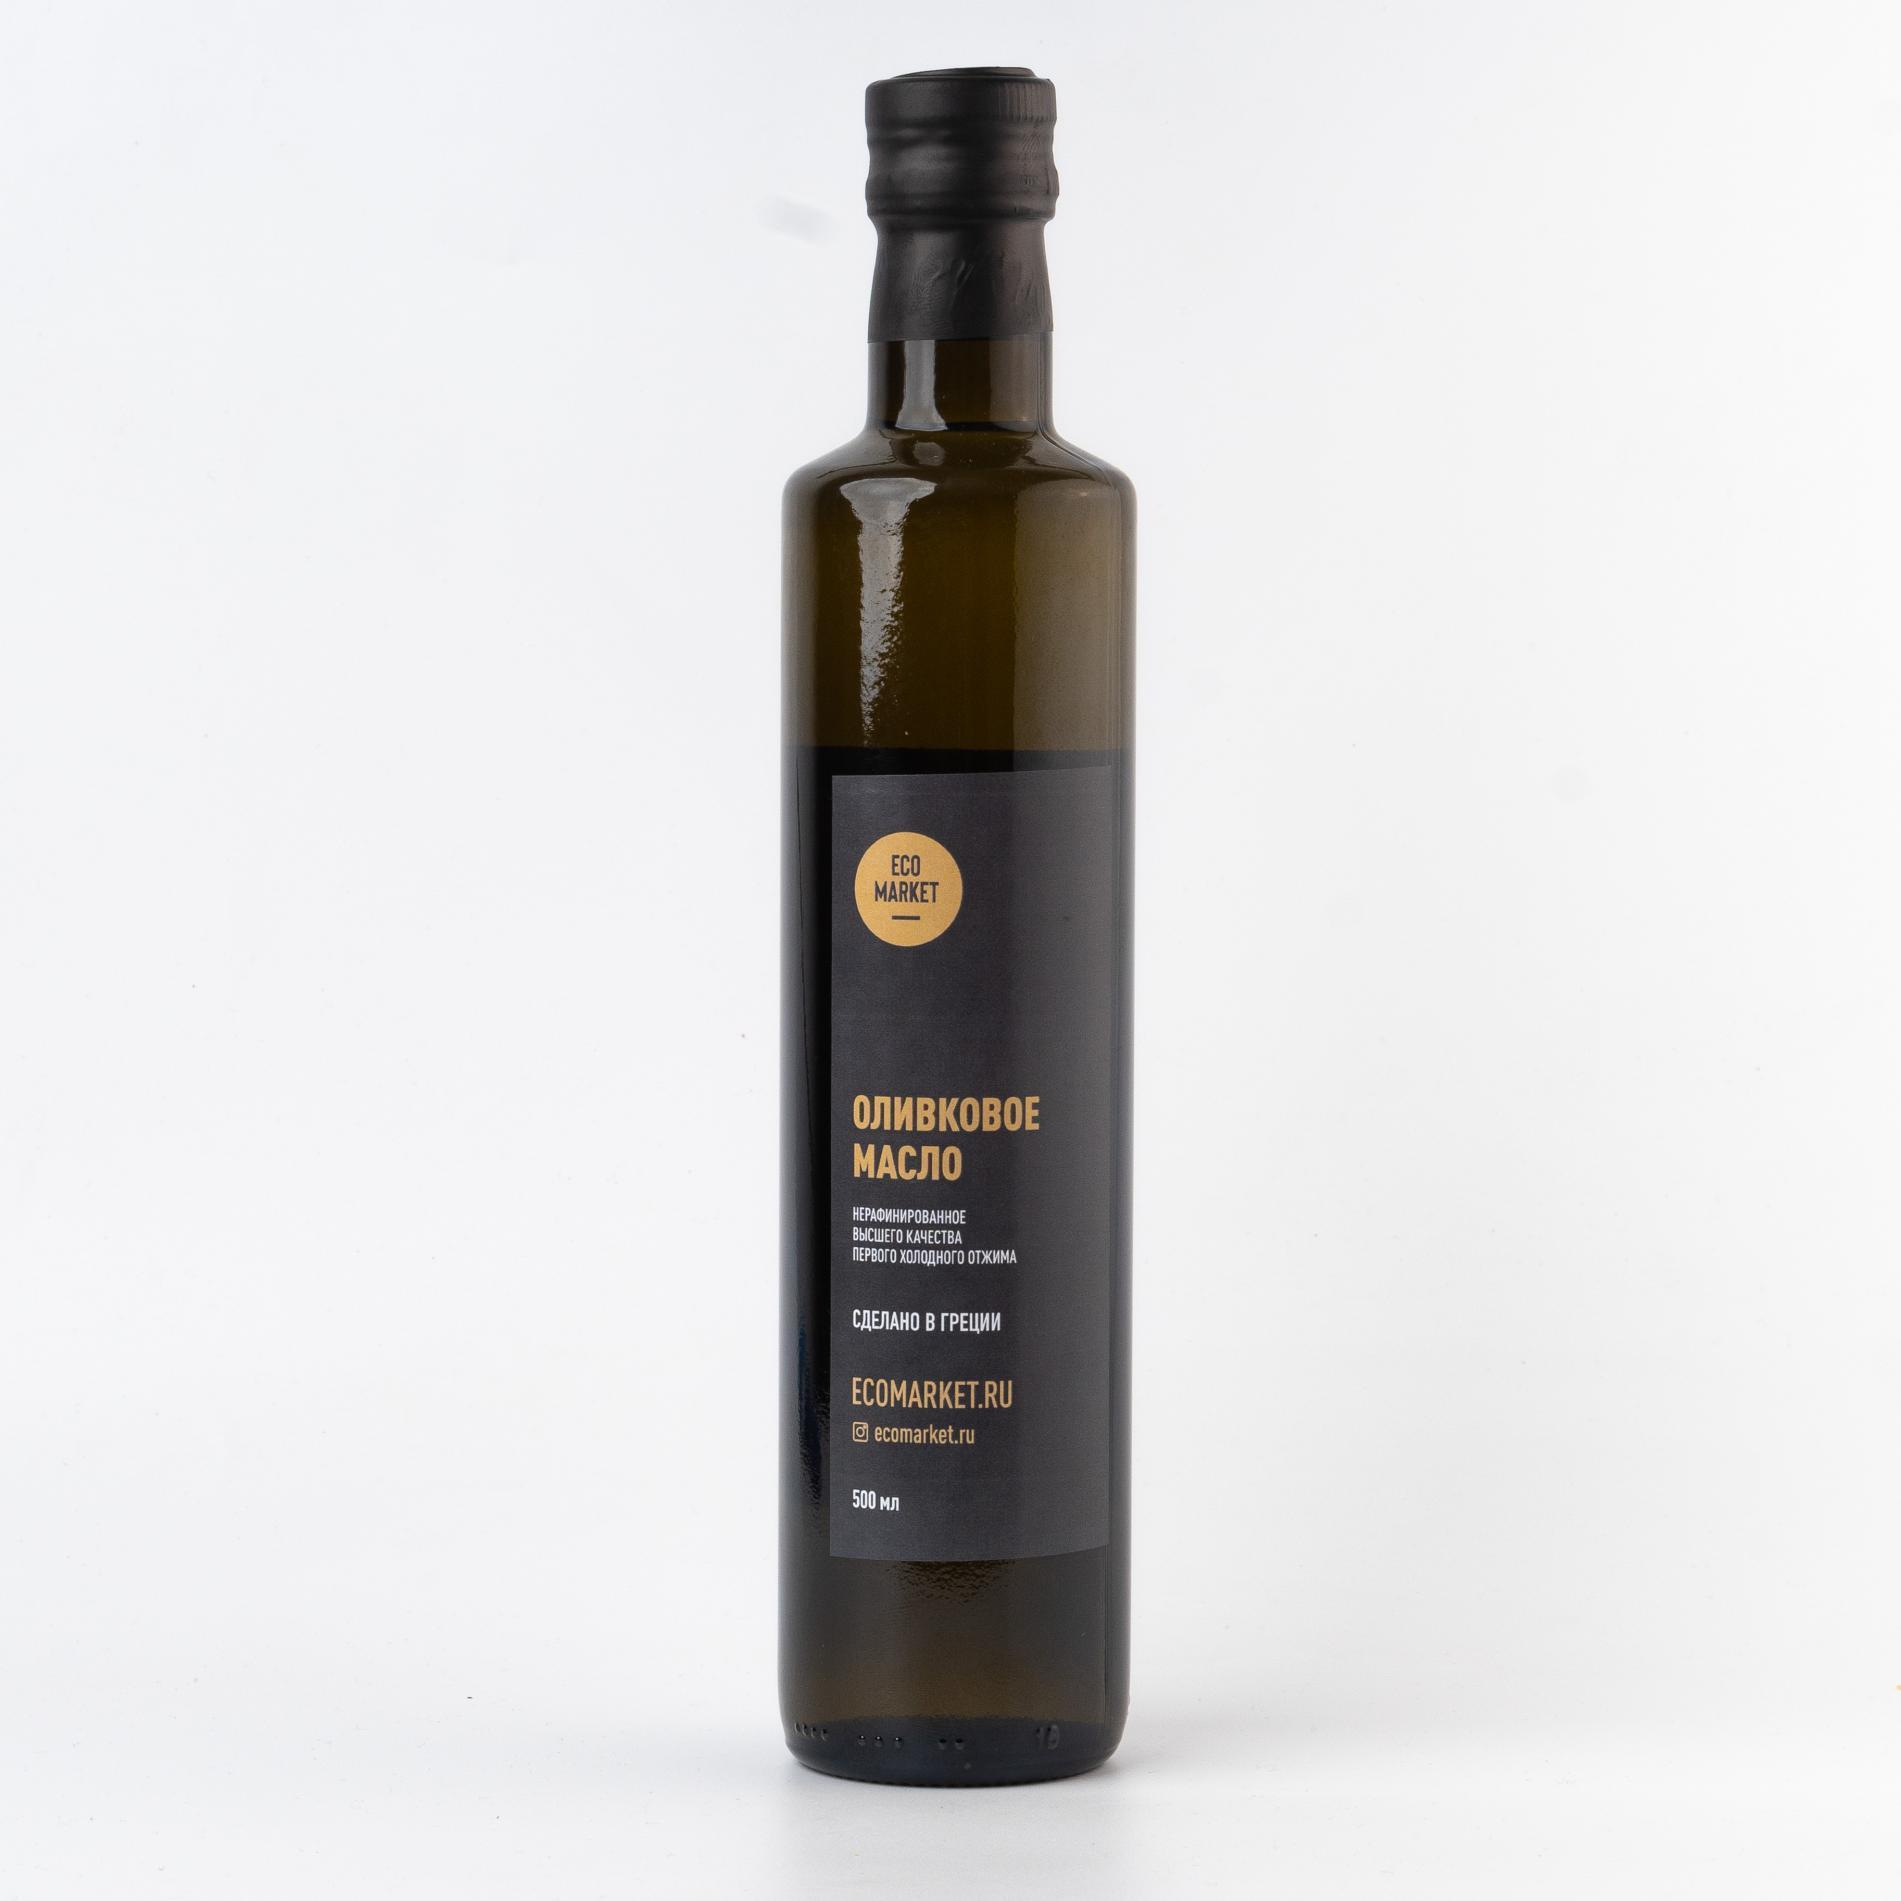 Оливковое масло Ecomarket.ru Extra Virgin, стекло - 500 мл (1 шт)